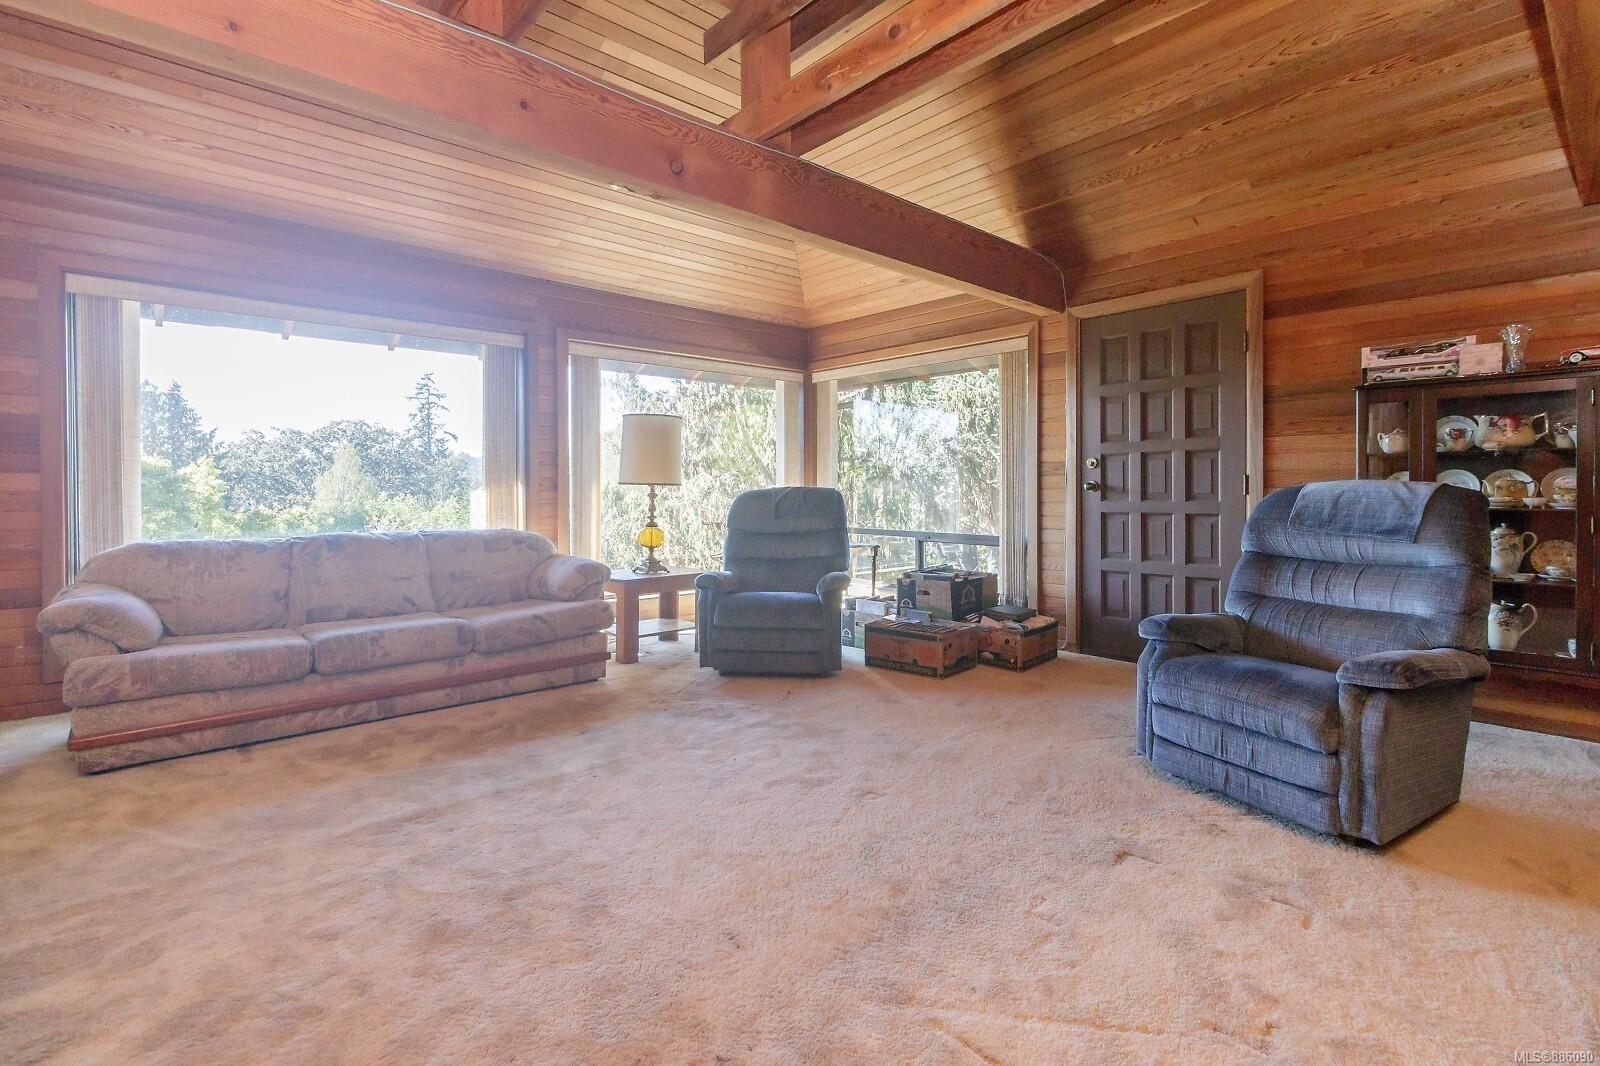 Photo 16: Photos: 4553 Blenkinsop Rd in : SE Blenkinsop House for sale (Saanich East)  : MLS®# 886090